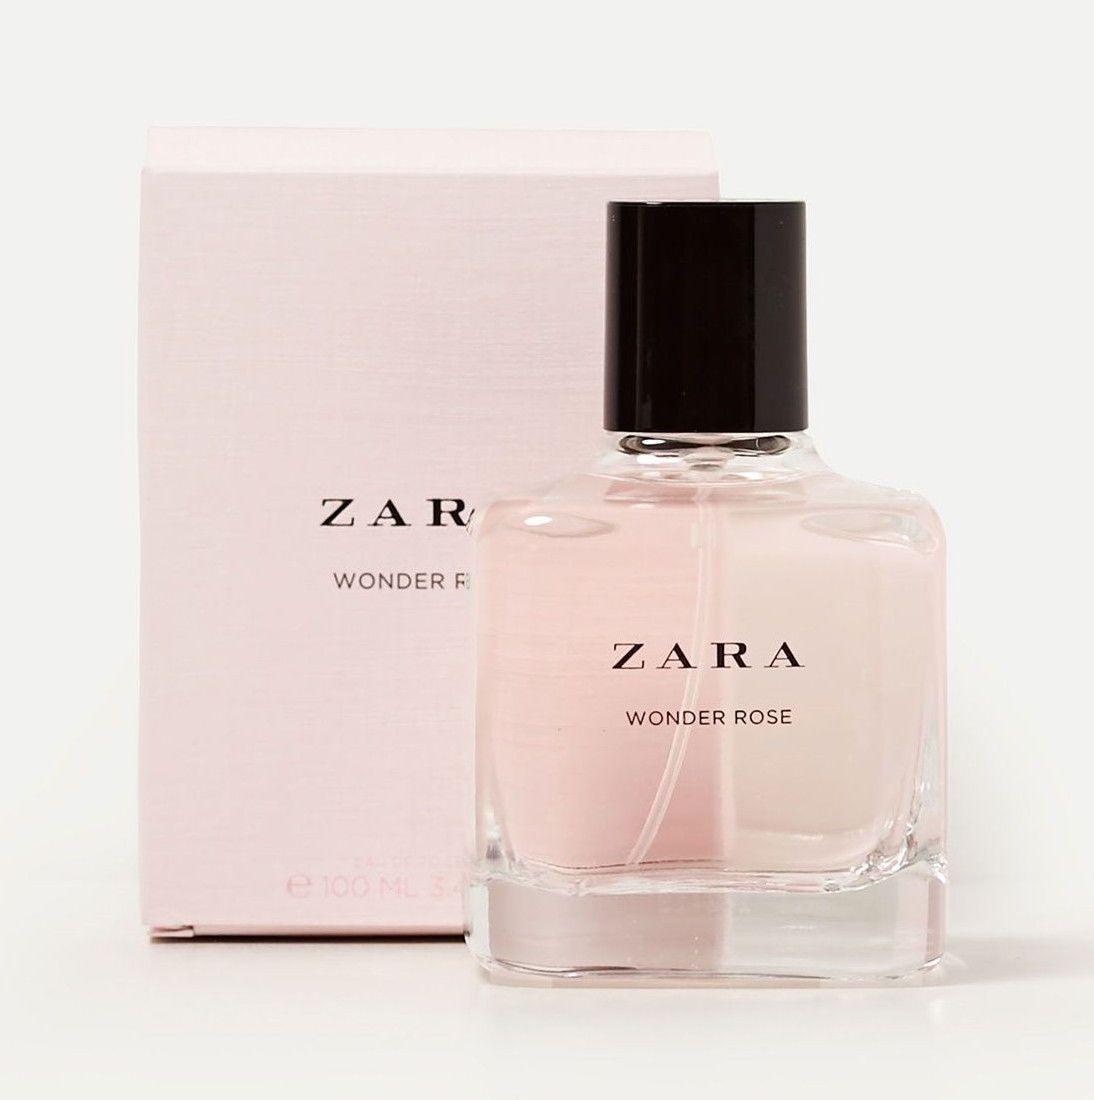 395147670 Zara Wonder Rose For Woman Eau De Toilette Edt Fragrance/ Perfume 30Ml